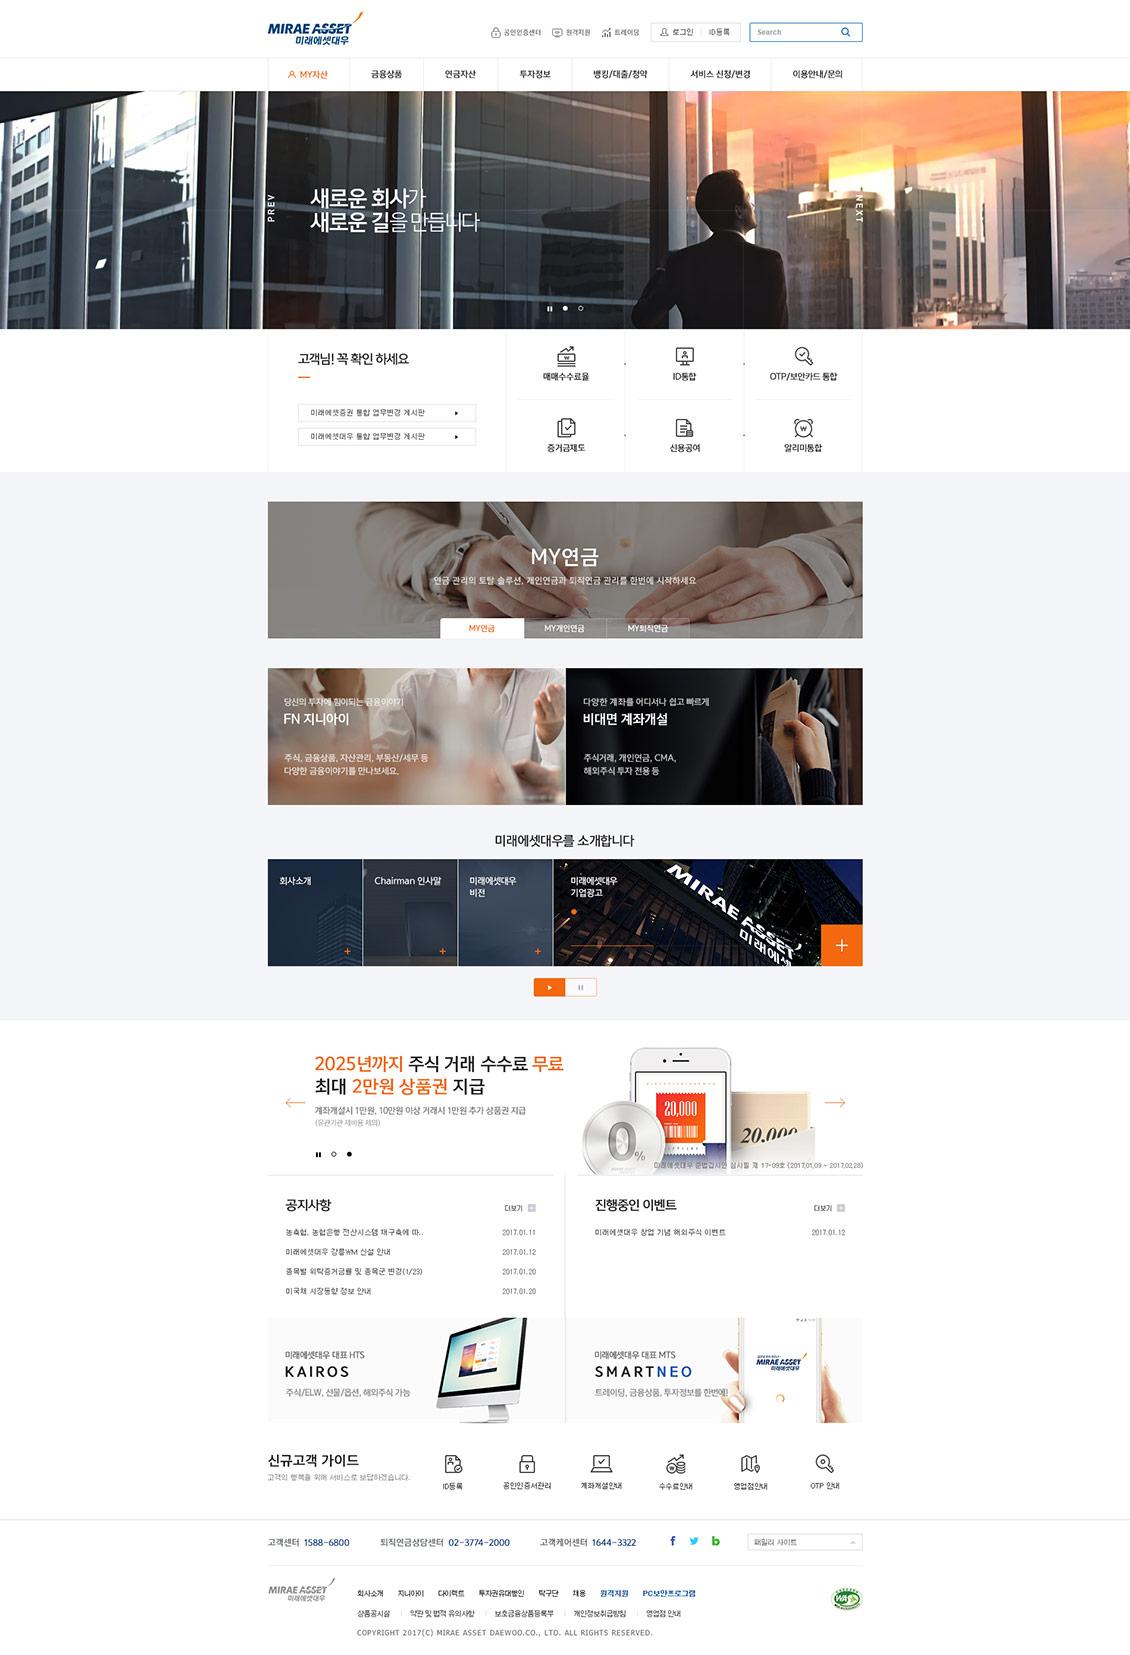 miraeassetdaewoo韓國金融企業網站